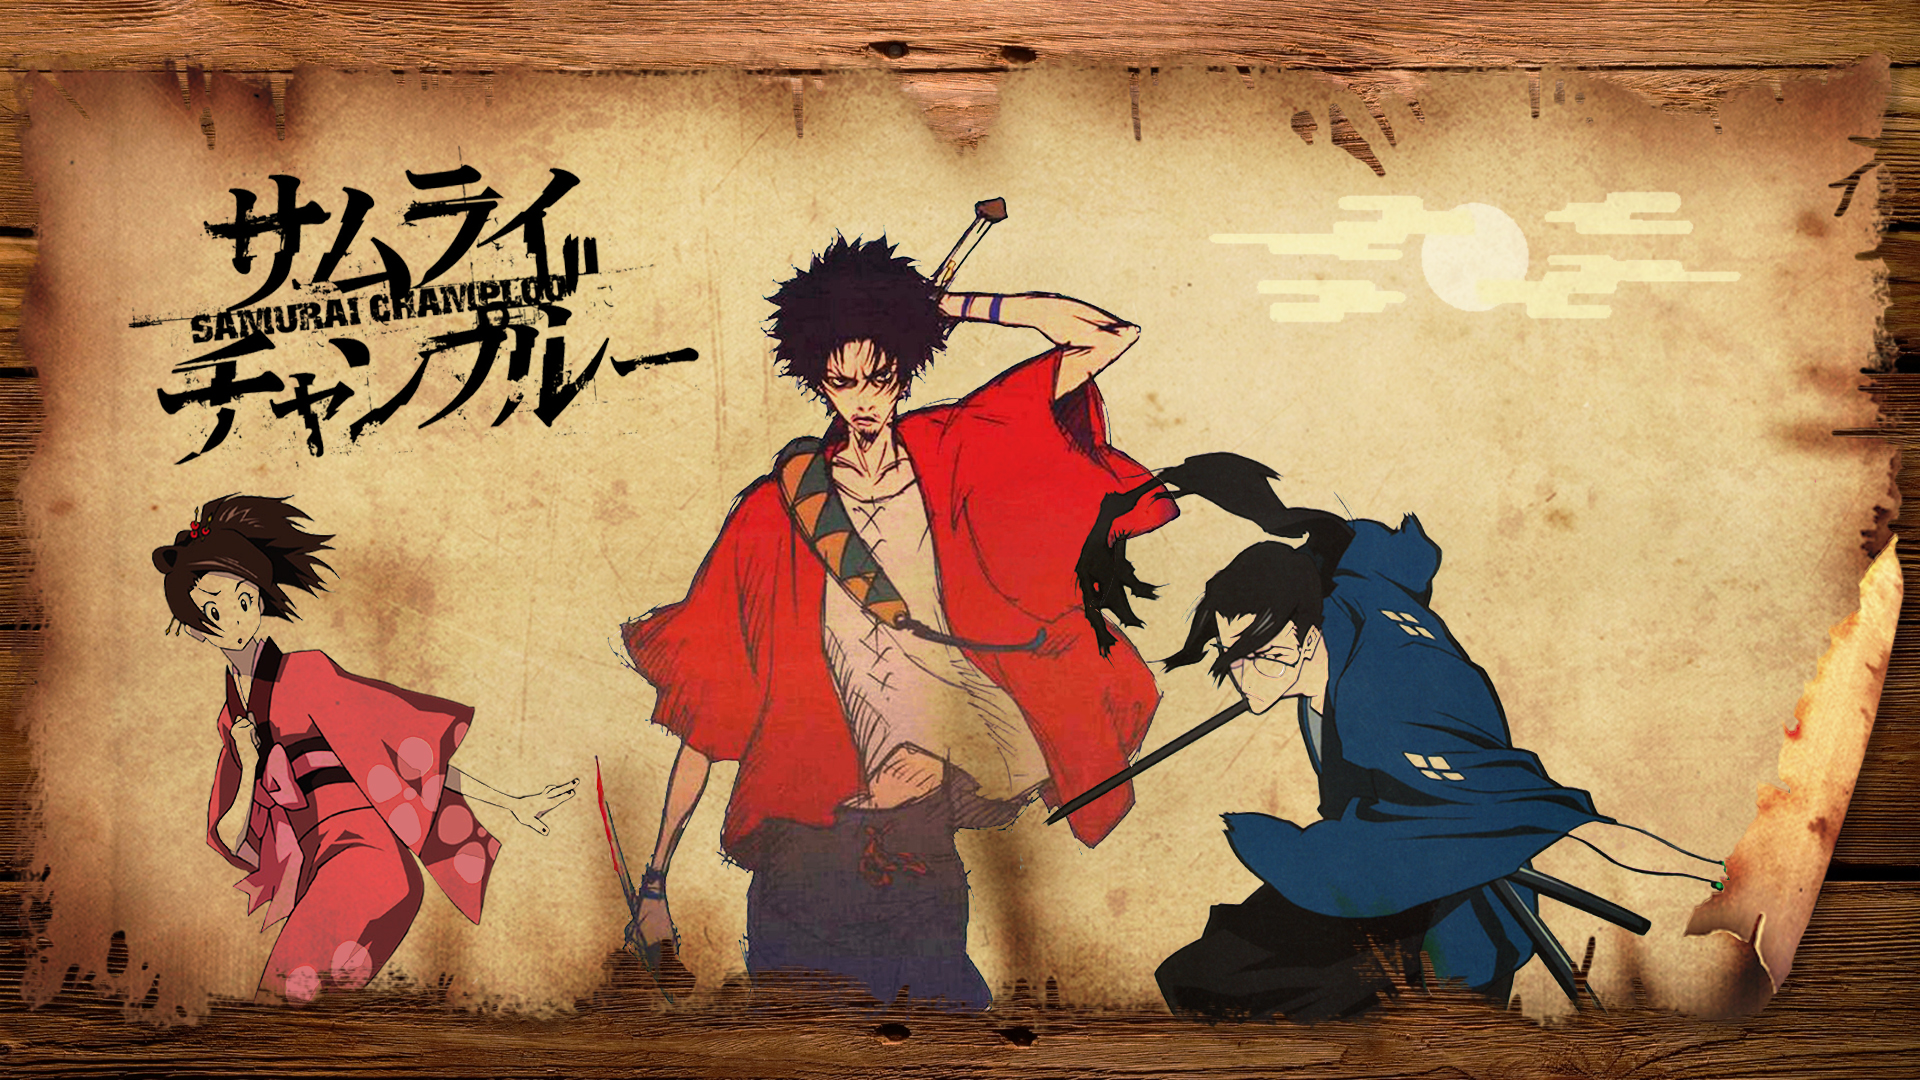 Samurai Champloo Wallpaper By Tonyzex1995 On Deviantart